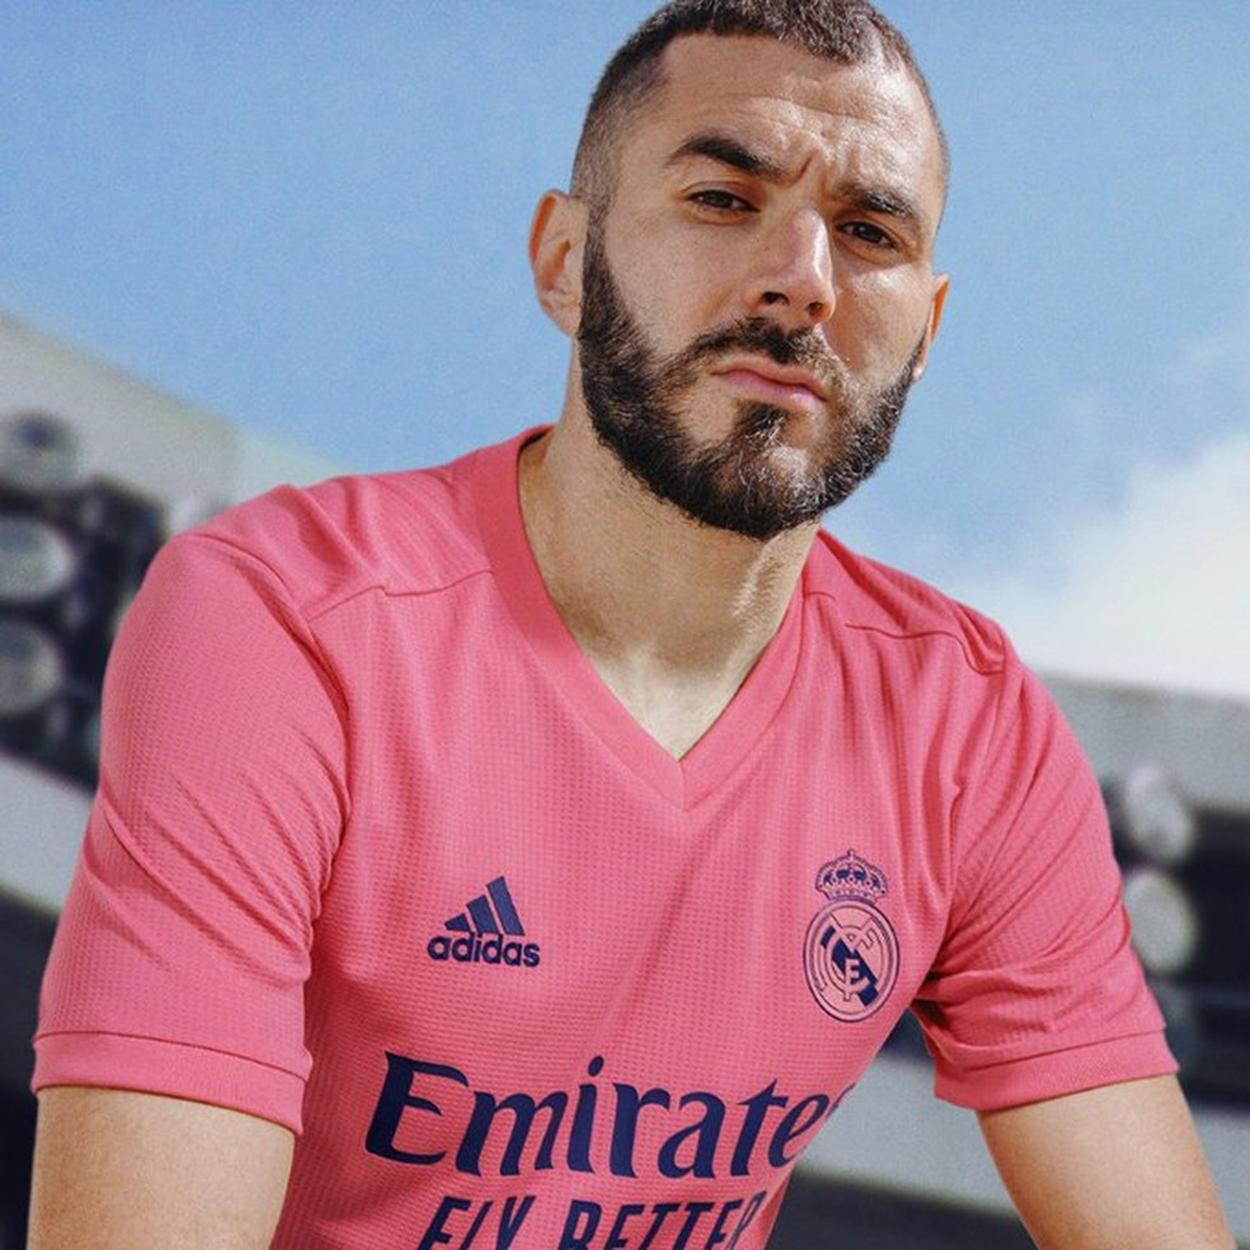 Camisa rosa dao Real Madrid modelo 20/21